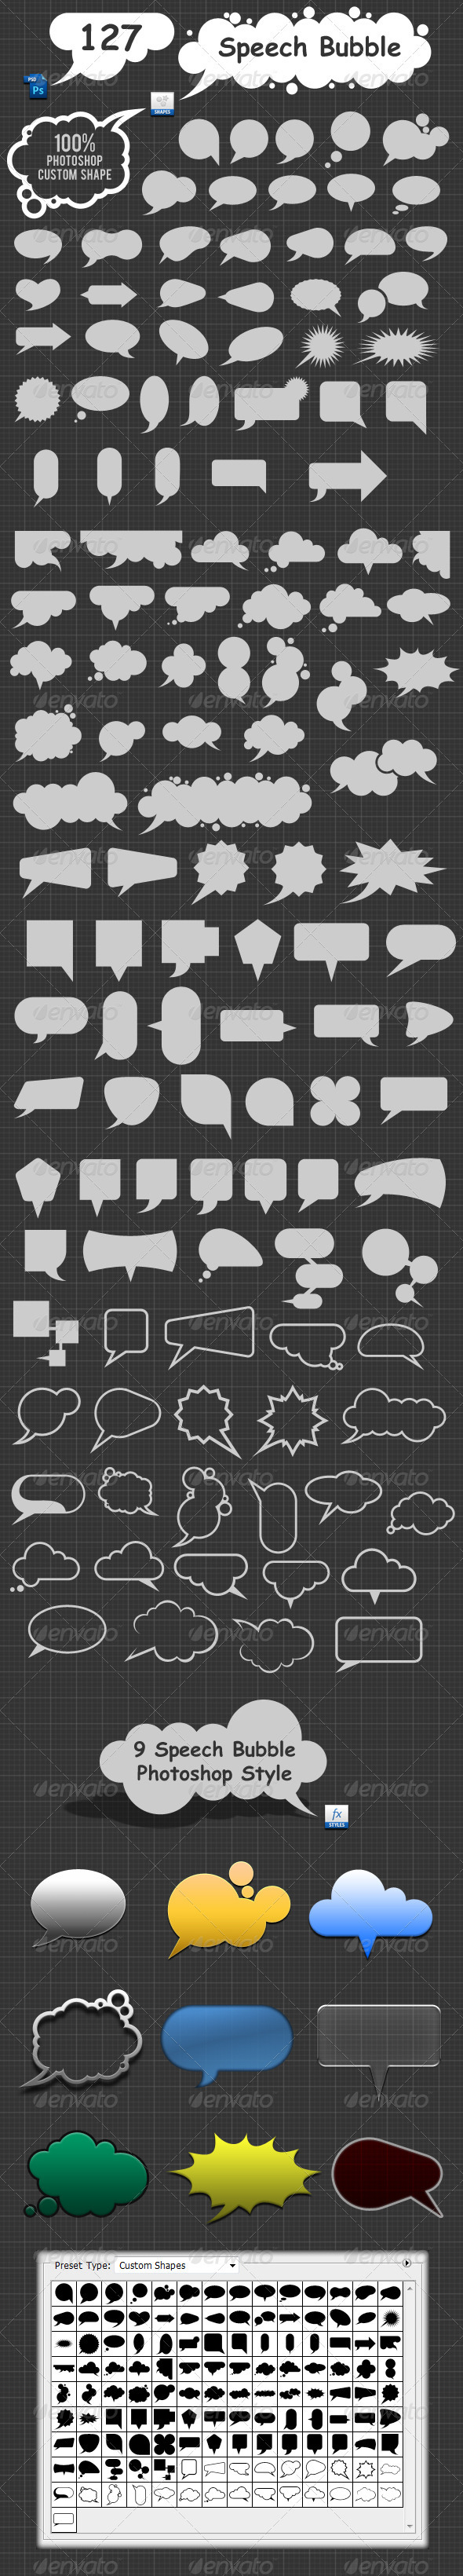 GraphicRiver 127 Speech Bubble Photoshop Custom Shapes 3167570